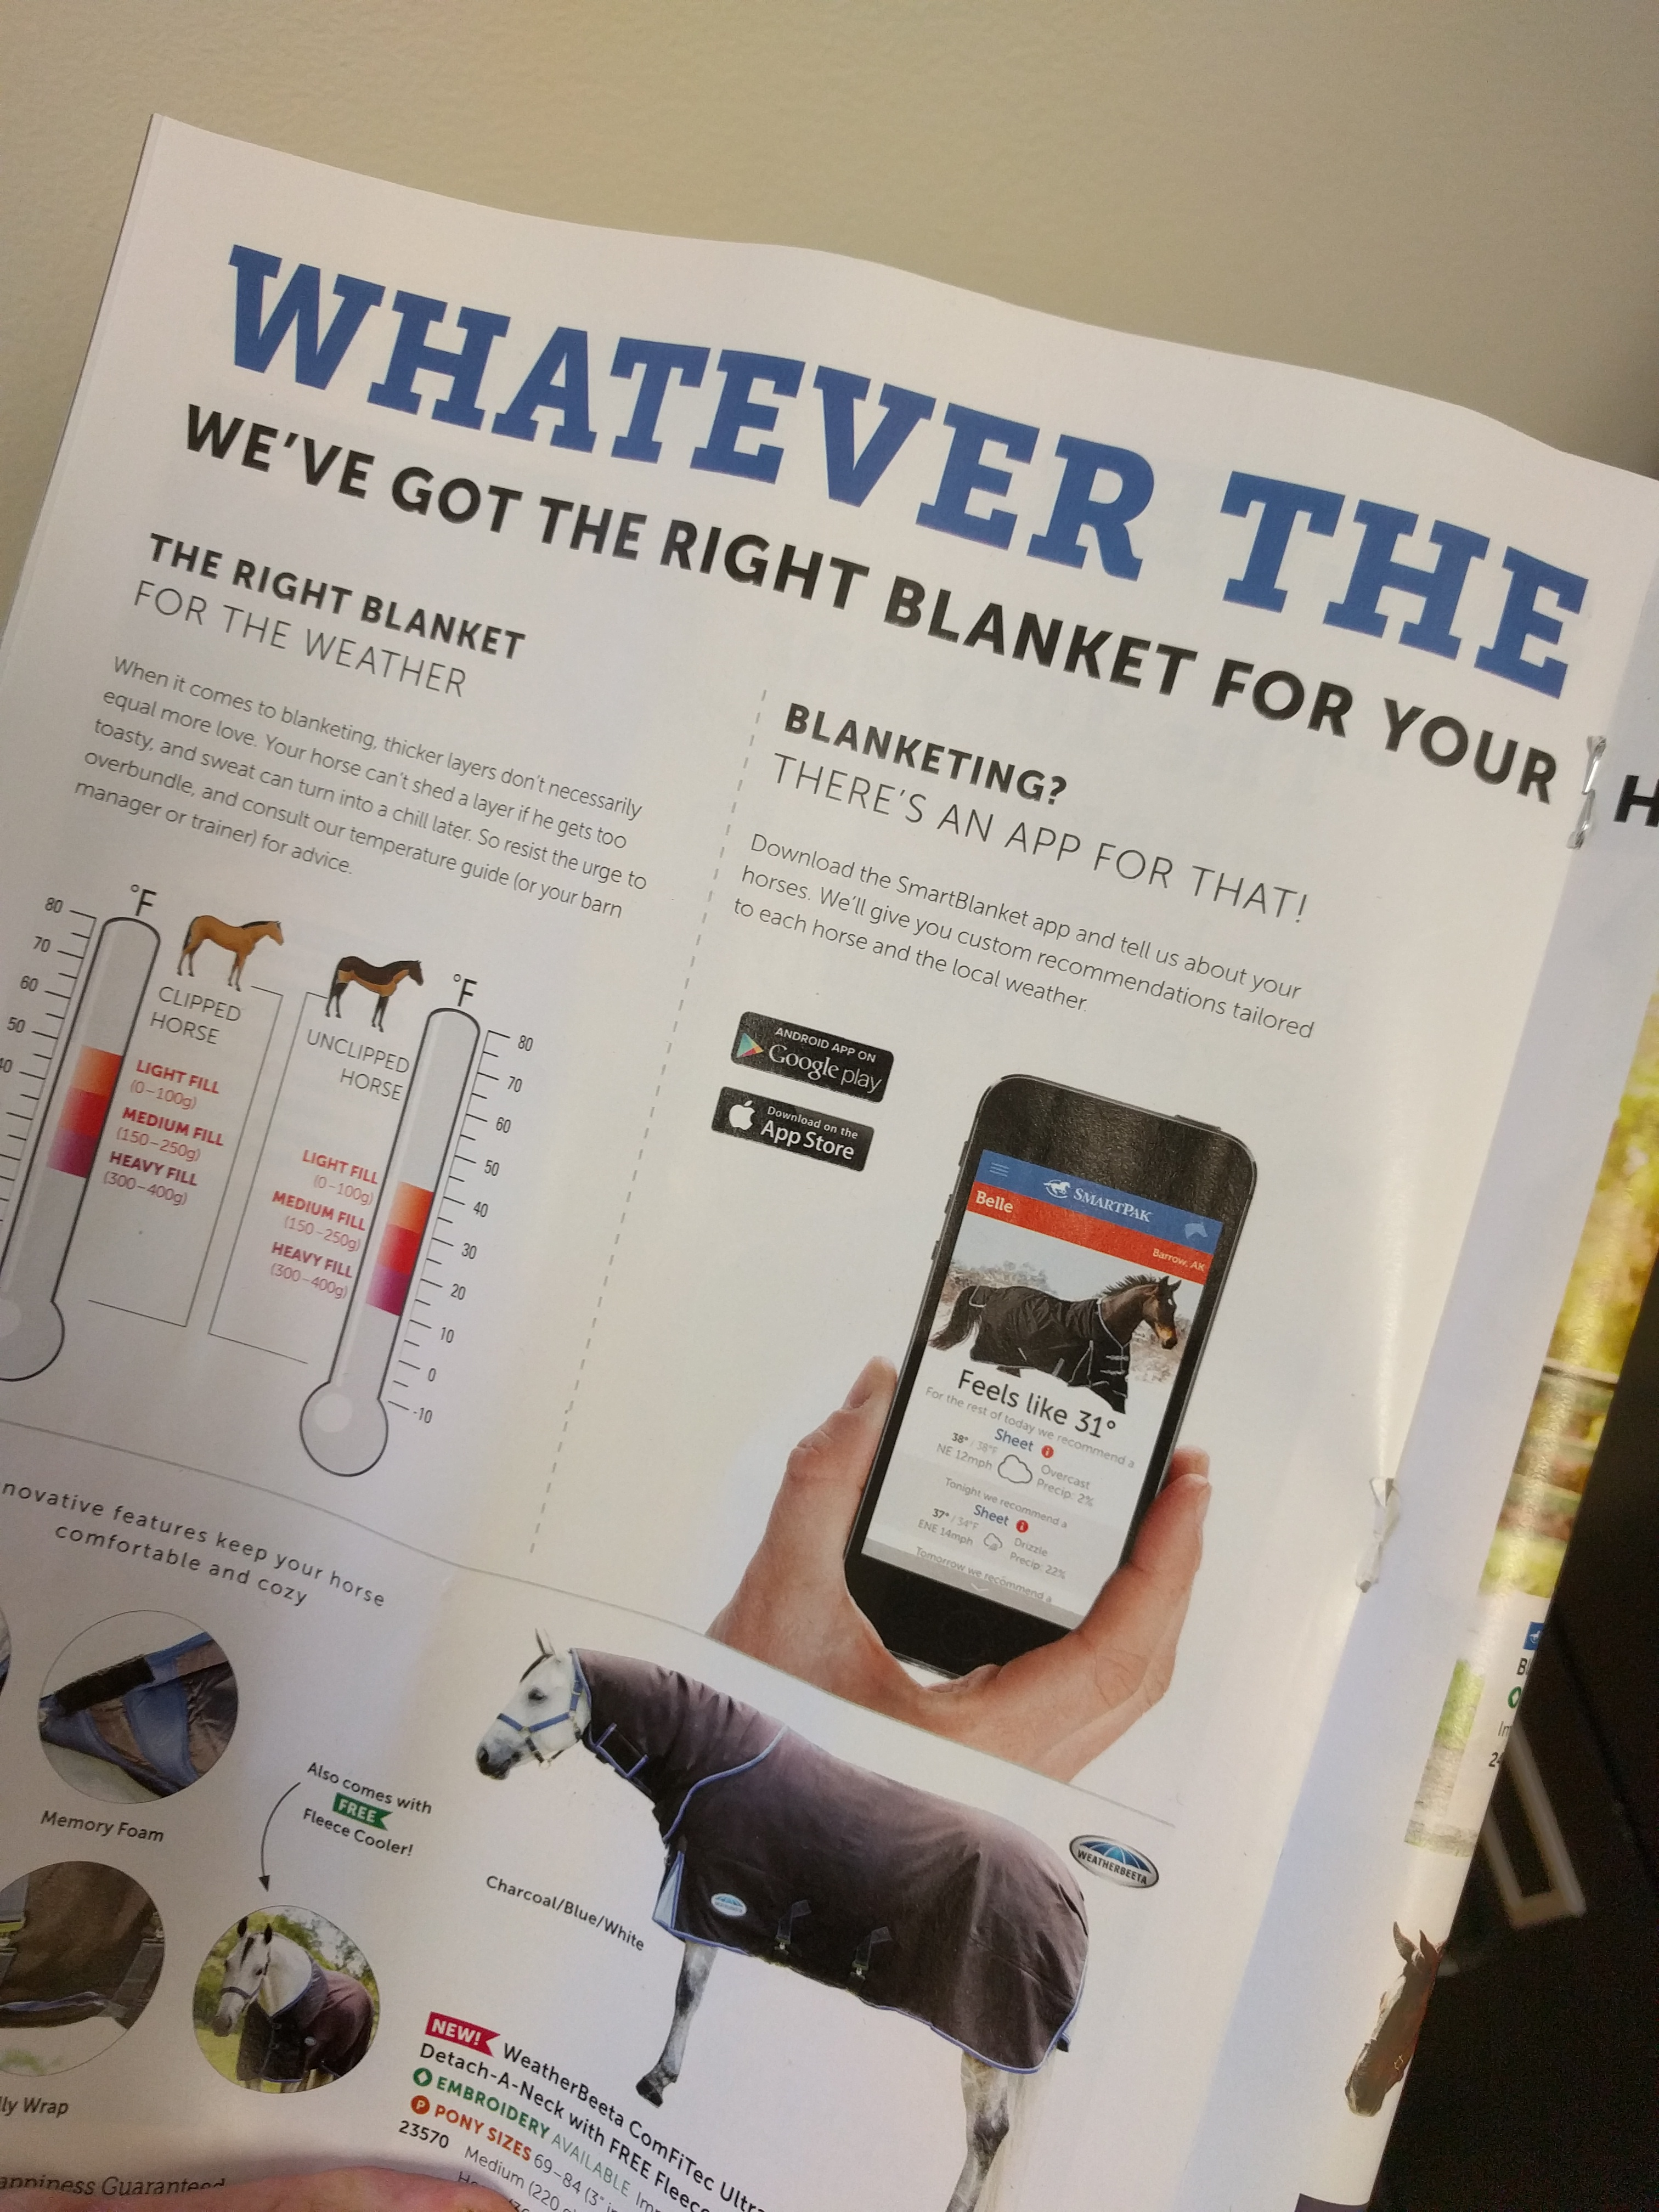 smart blanket - smartpakequine app - catalog image - Poudre